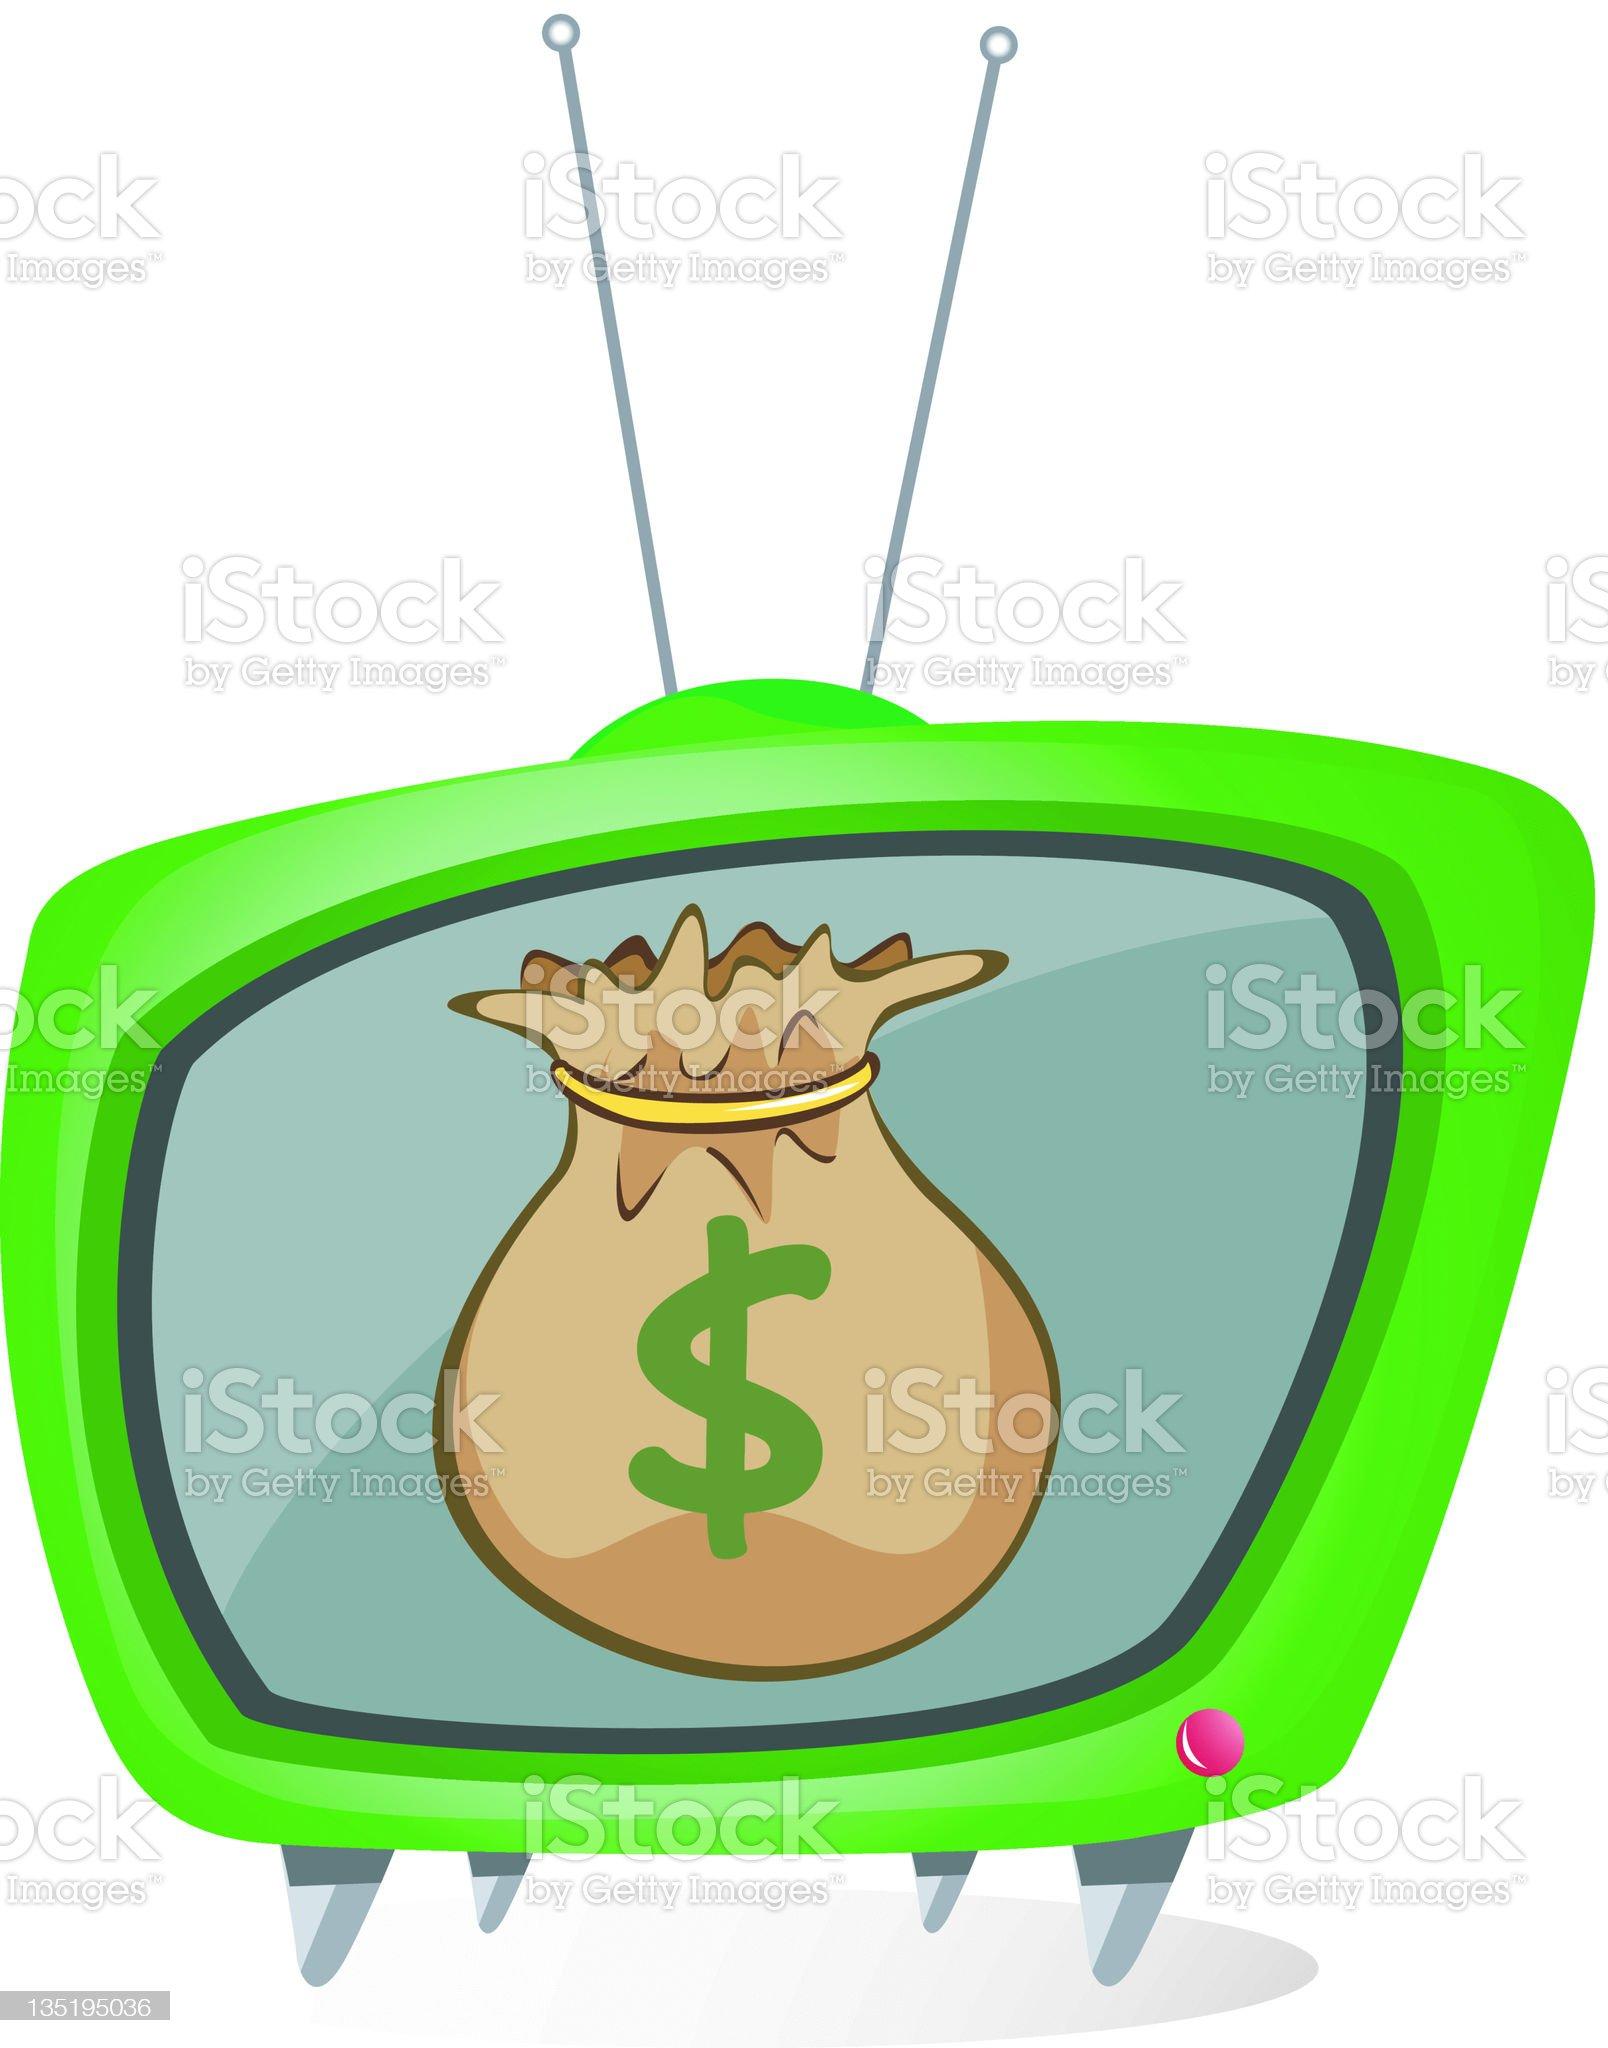 Money Maker royalty-free stock vector art